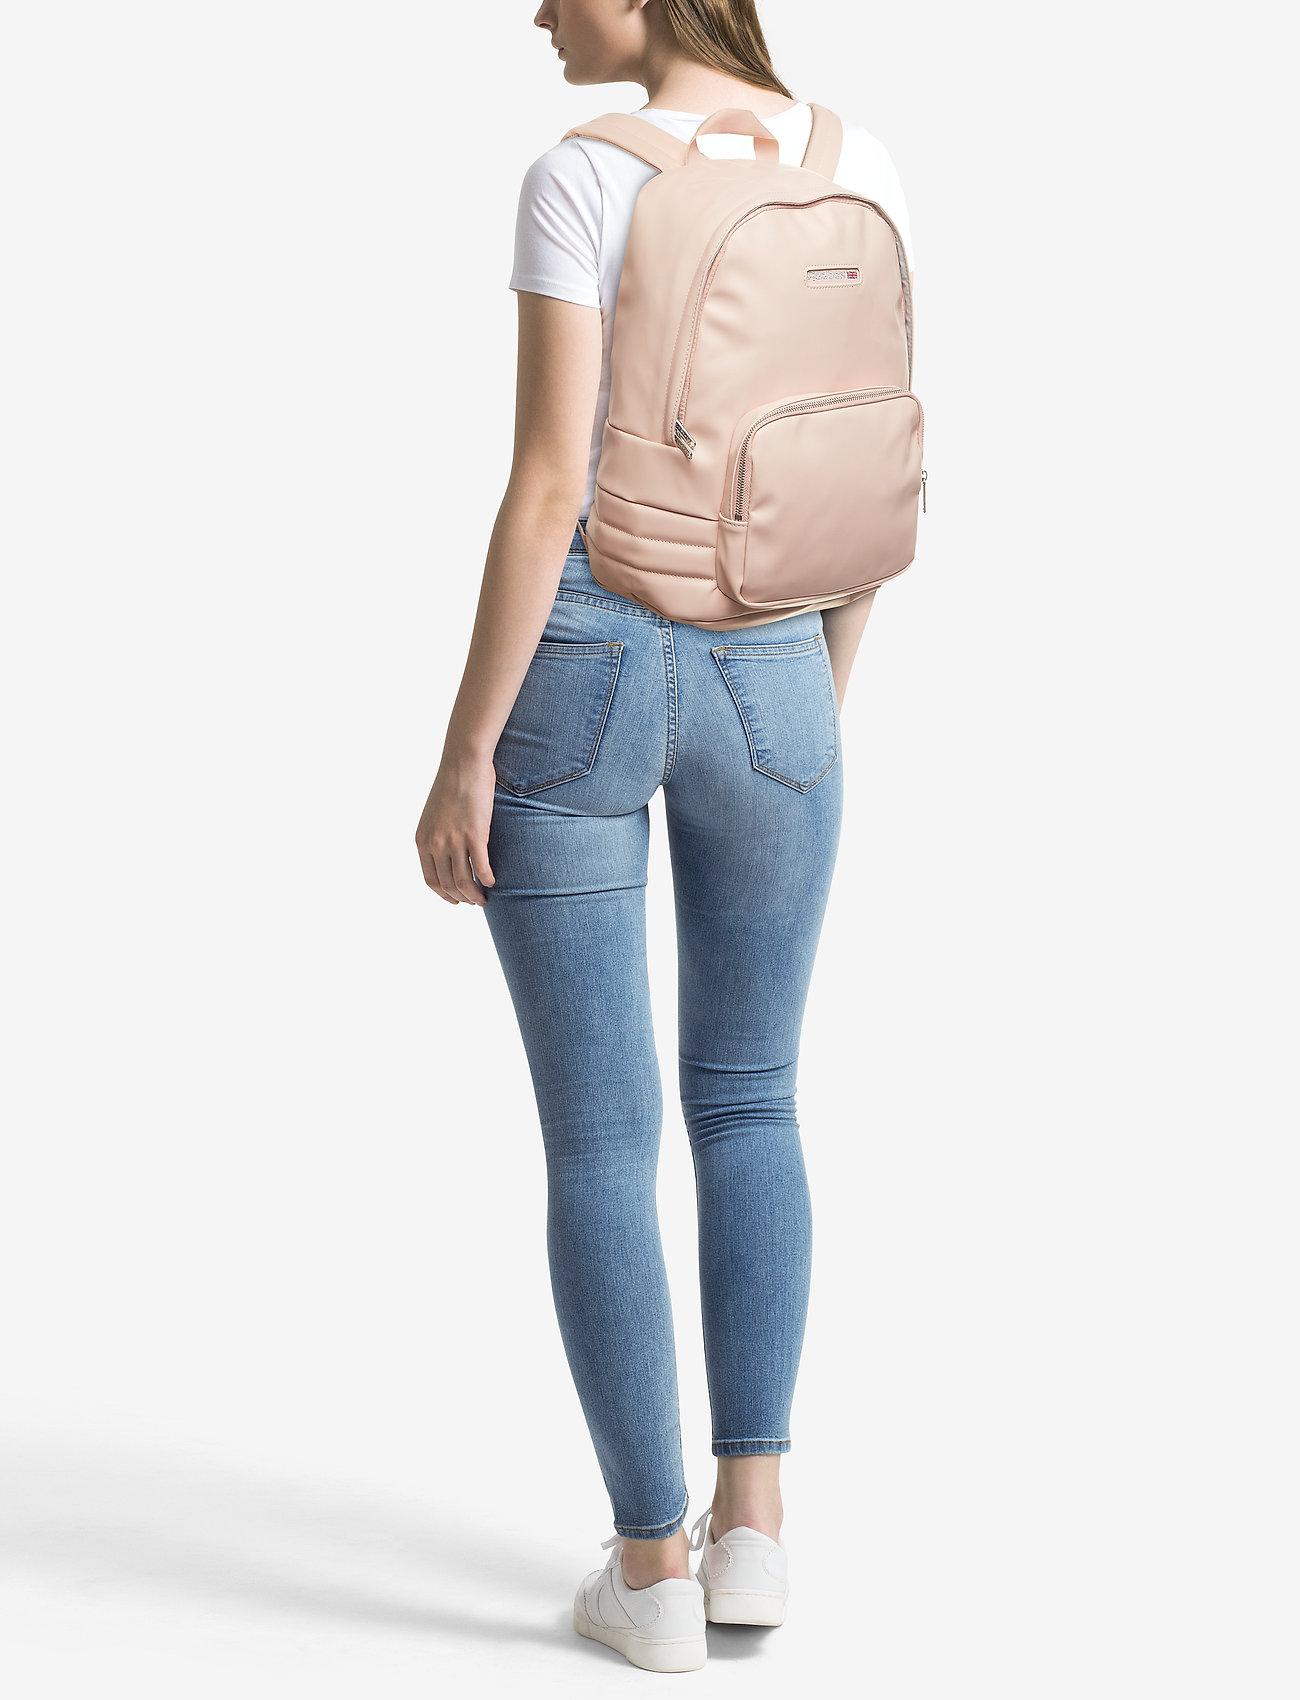 Reebok Classics CL Freestyle Backpack - BUFF